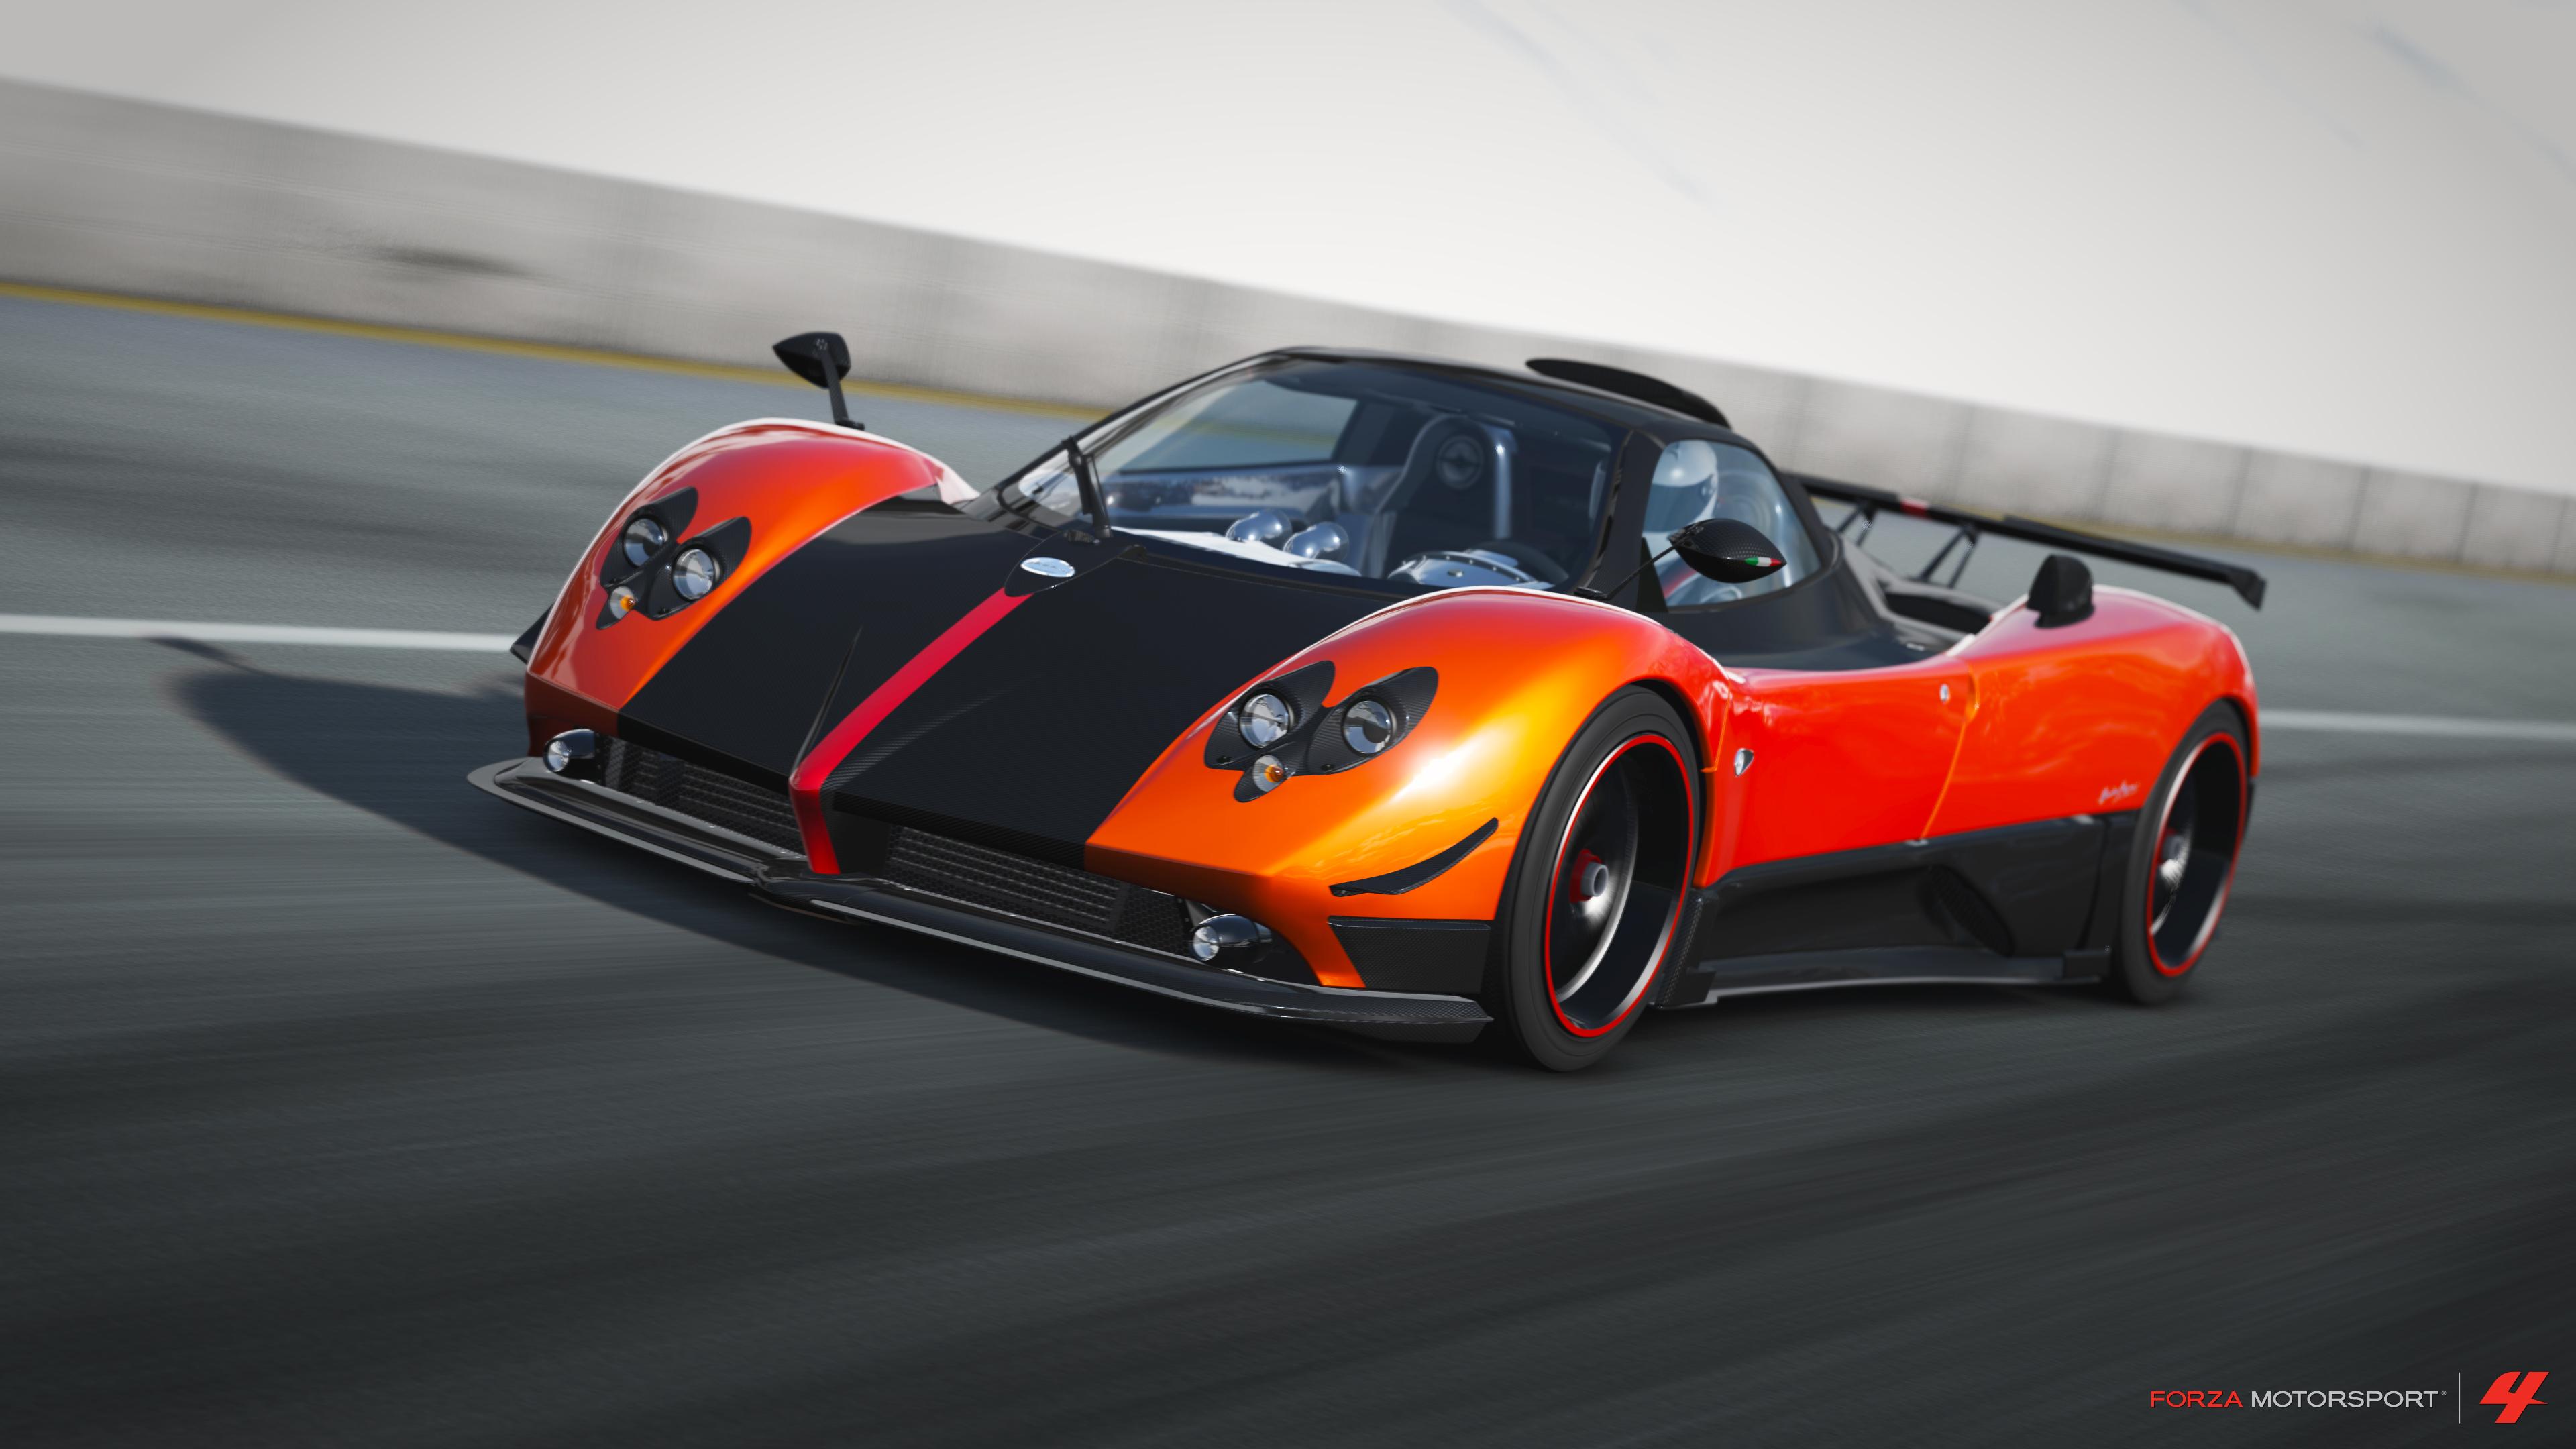 Pagani Zonda Cinque Roadster by SoupaSeb on DeviantArt